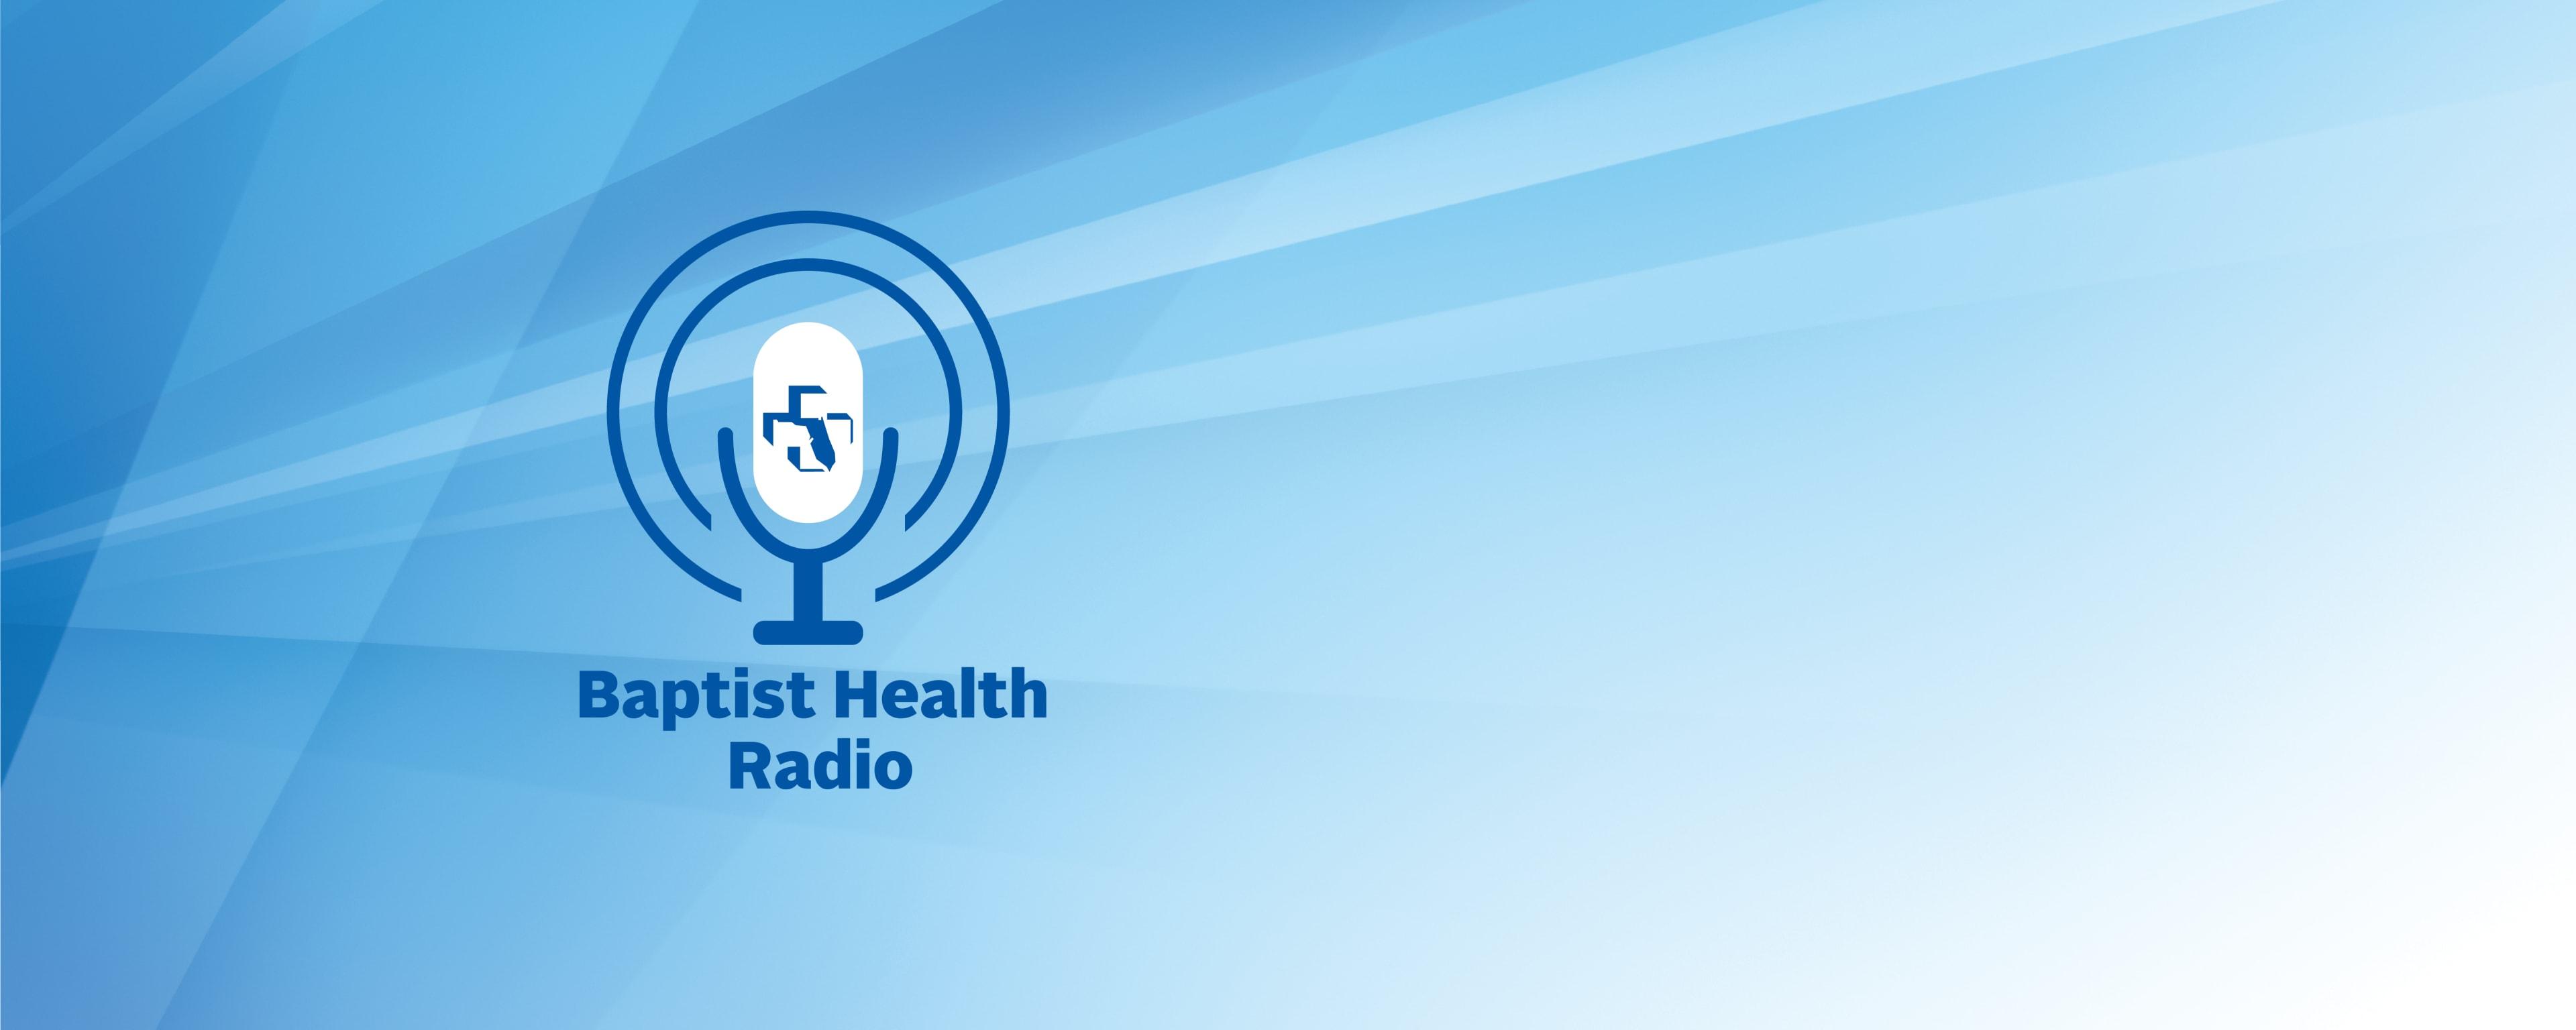 baptist health radio logo on blue background